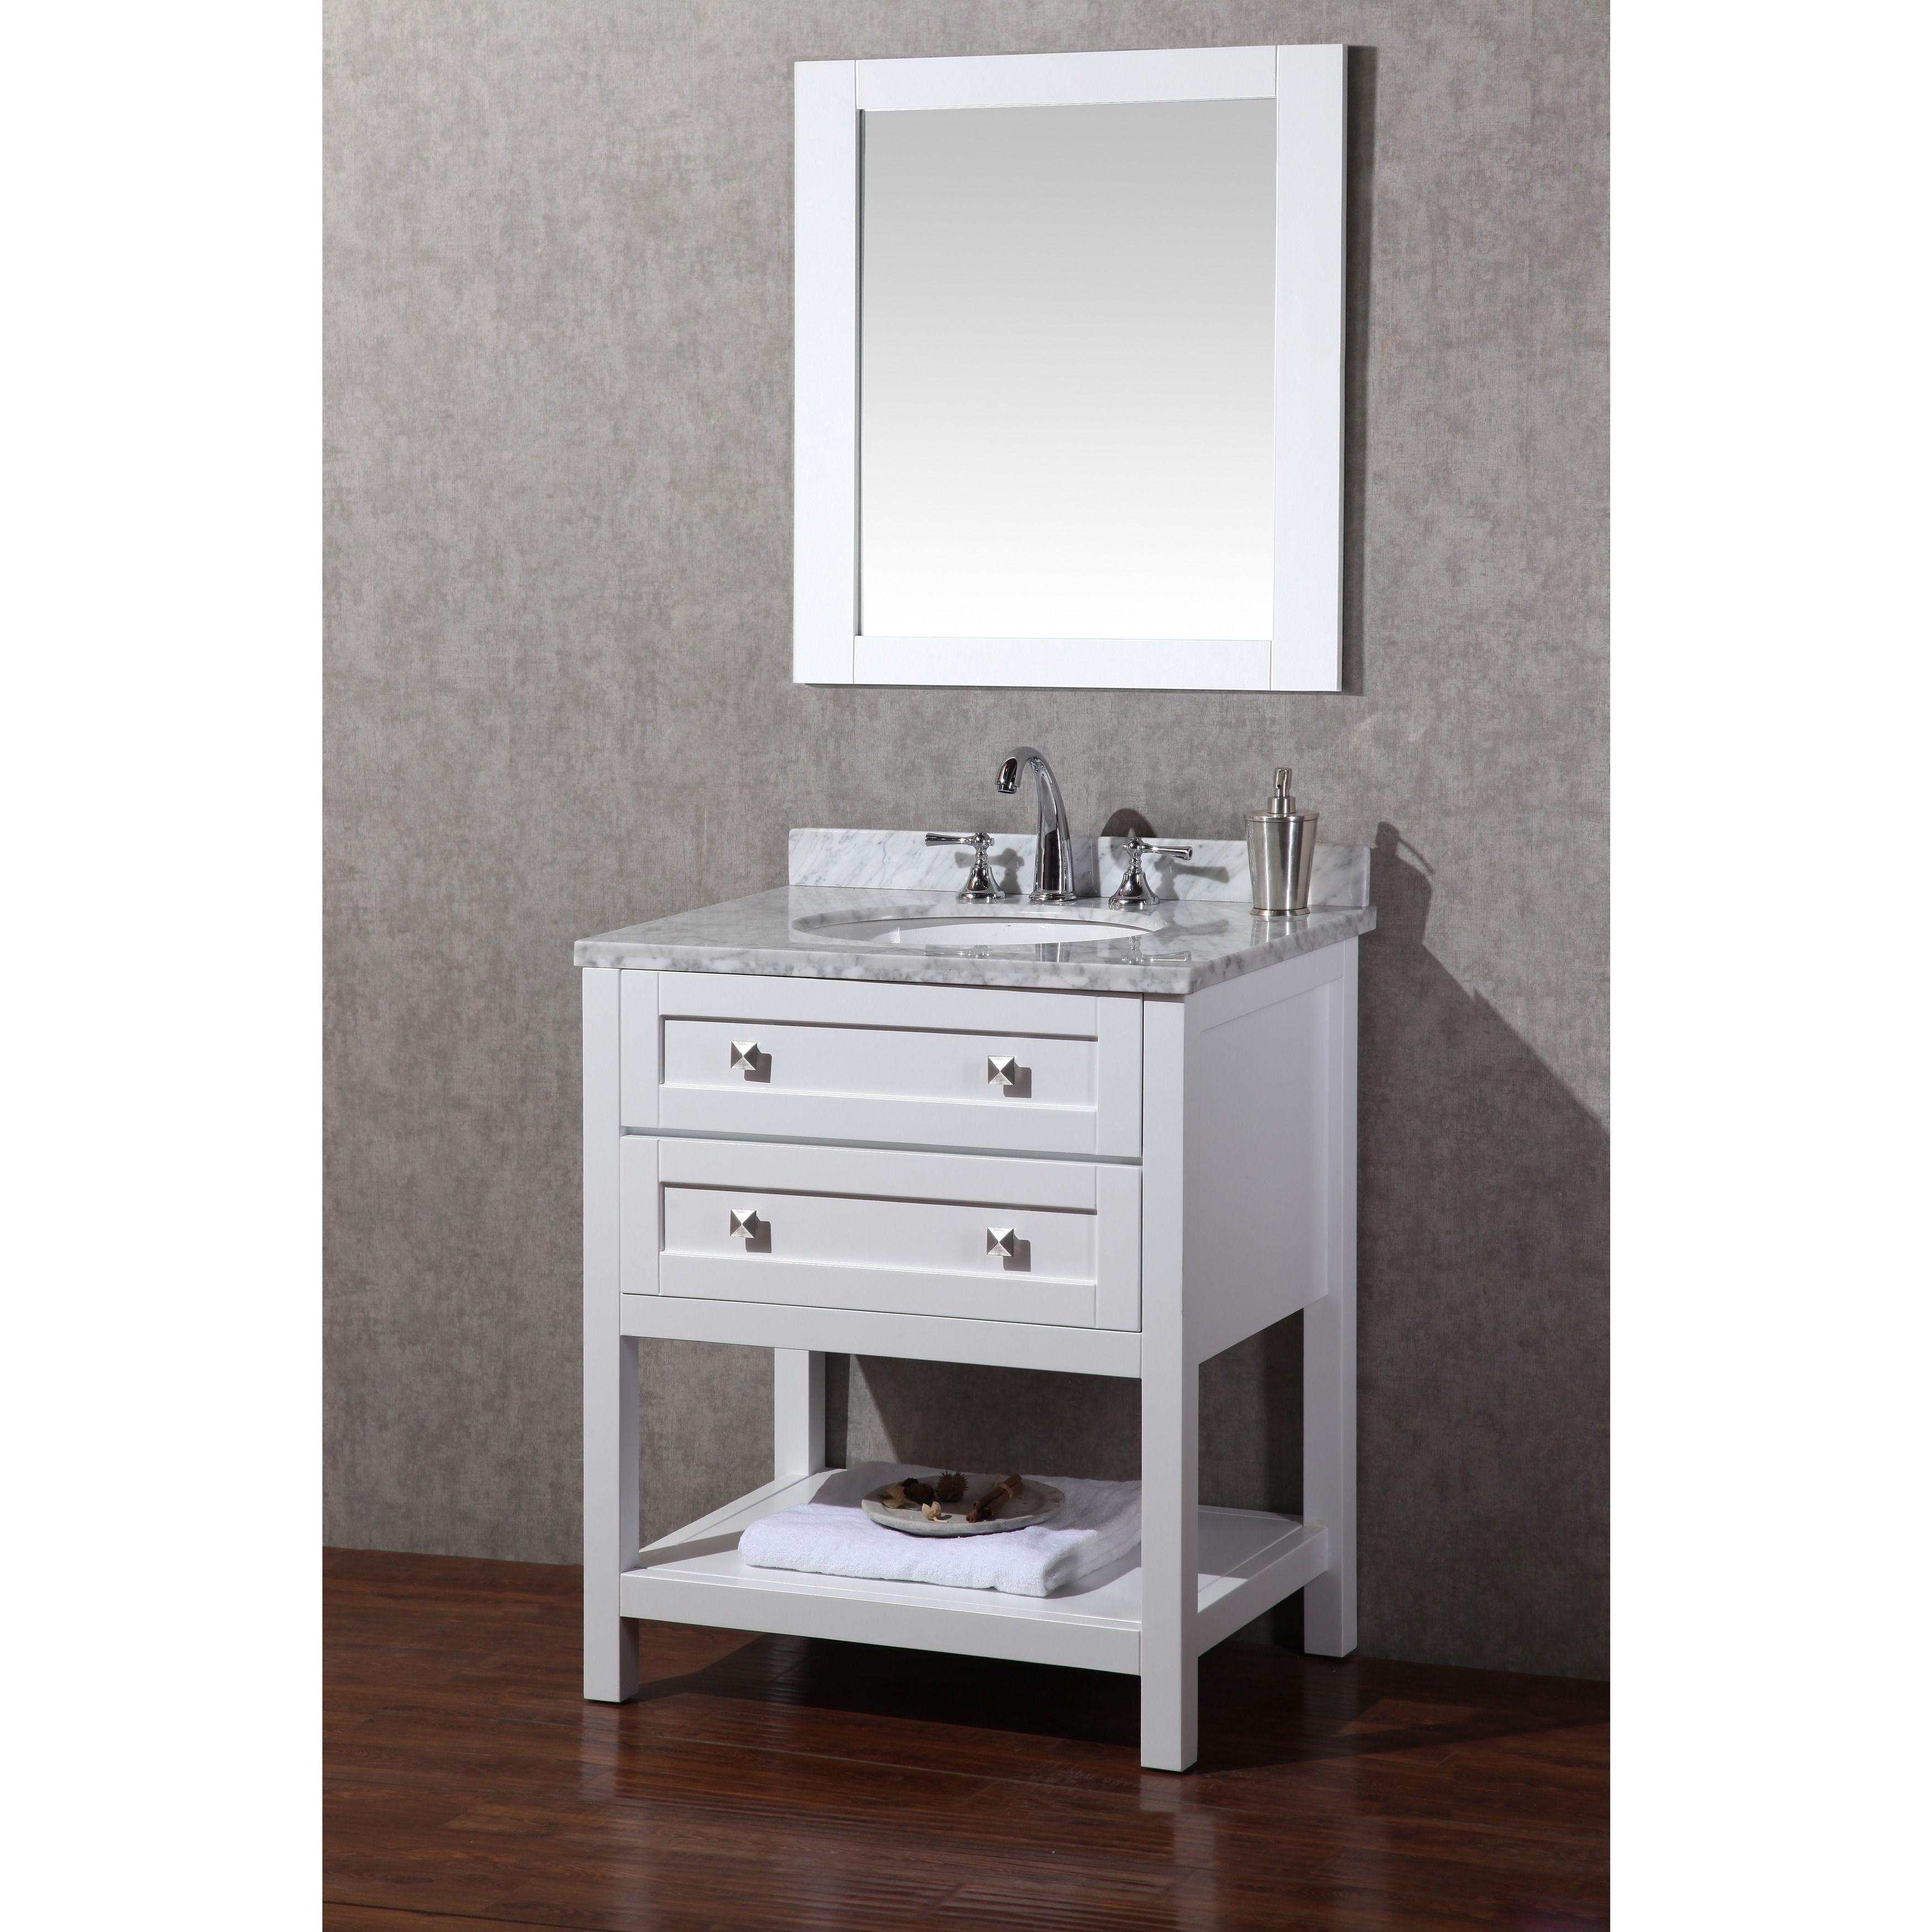 Stufurhome Marla 30 inch White Single Sink Bathroom Vanity with